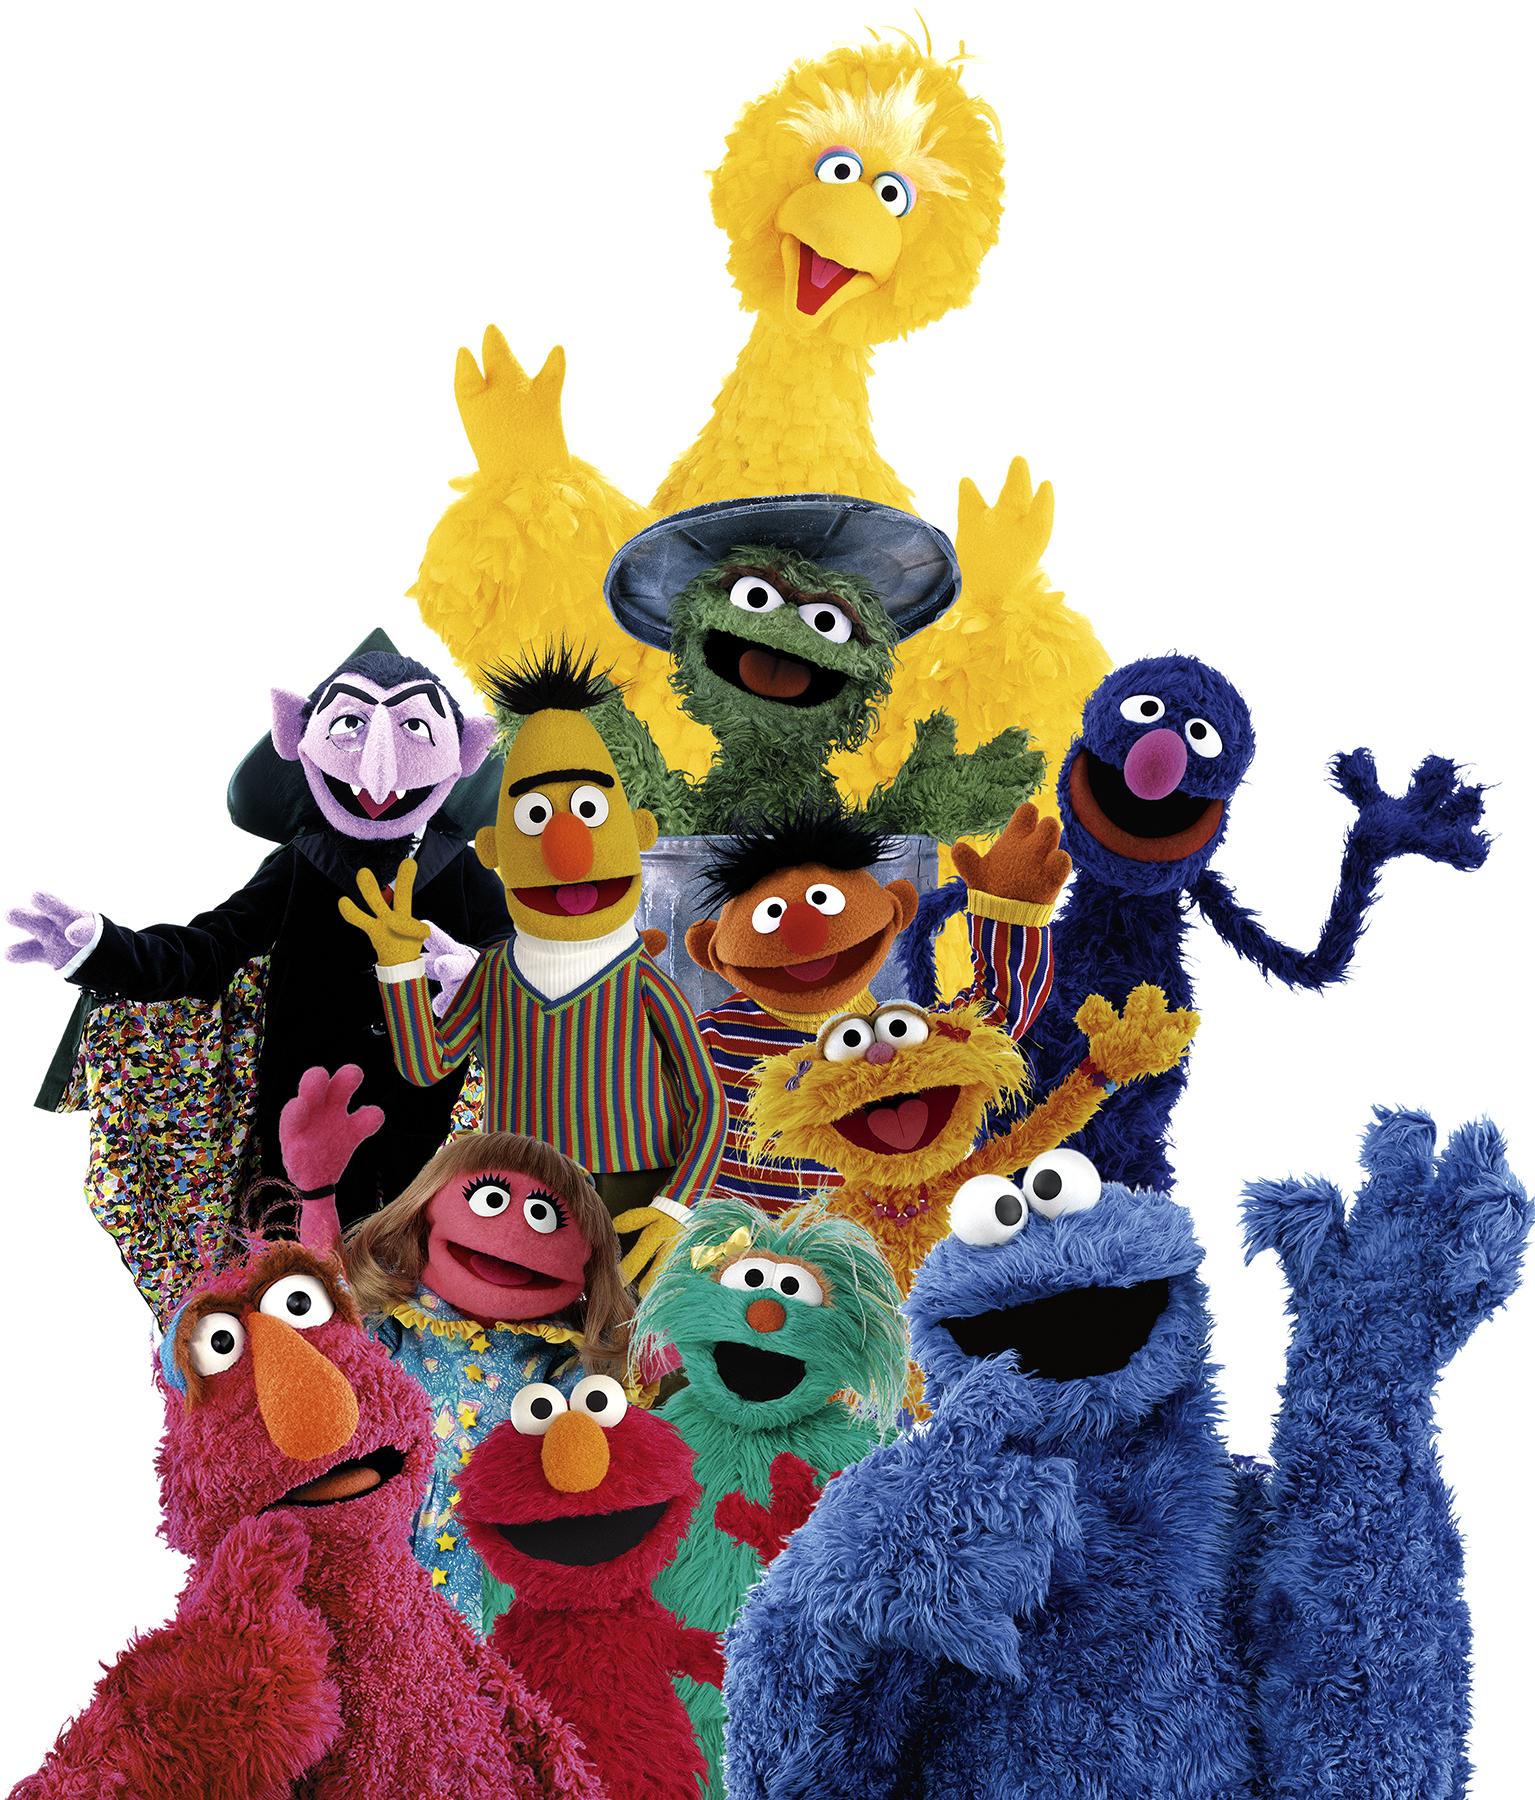 Sesame Street - Muppet Wiki